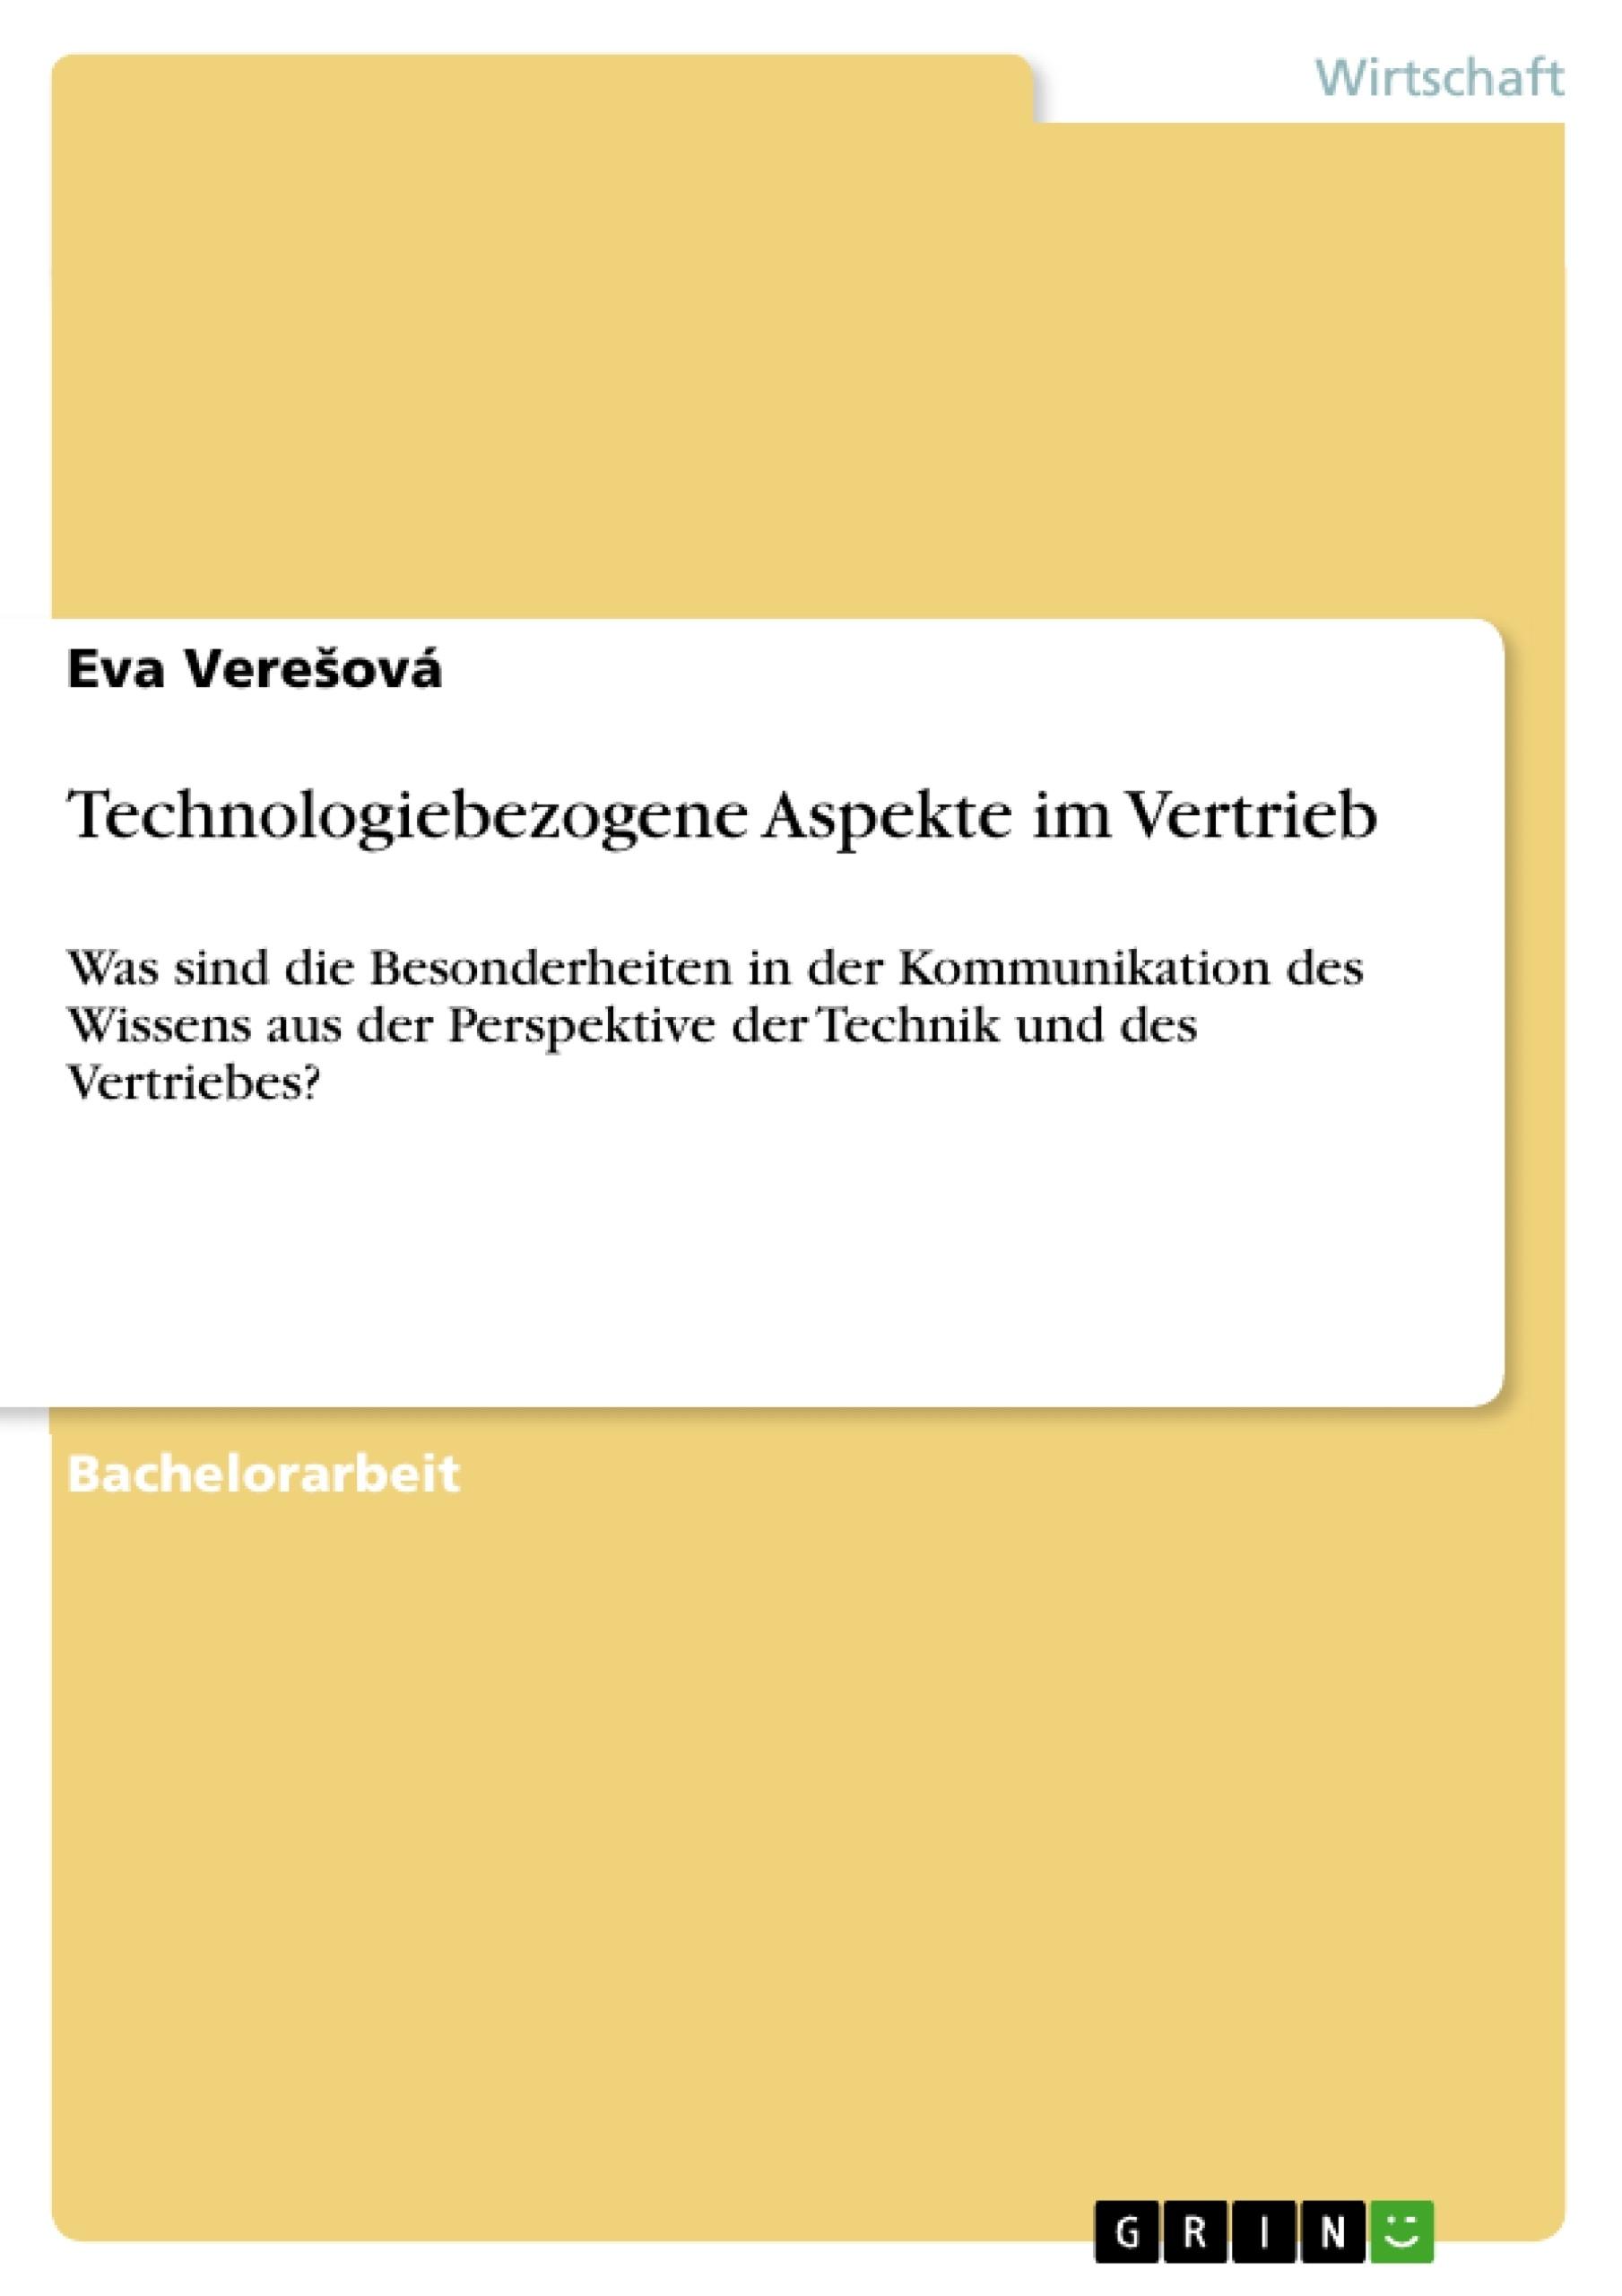 Titel: Technologiebezogene Aspekte im Vertrieb